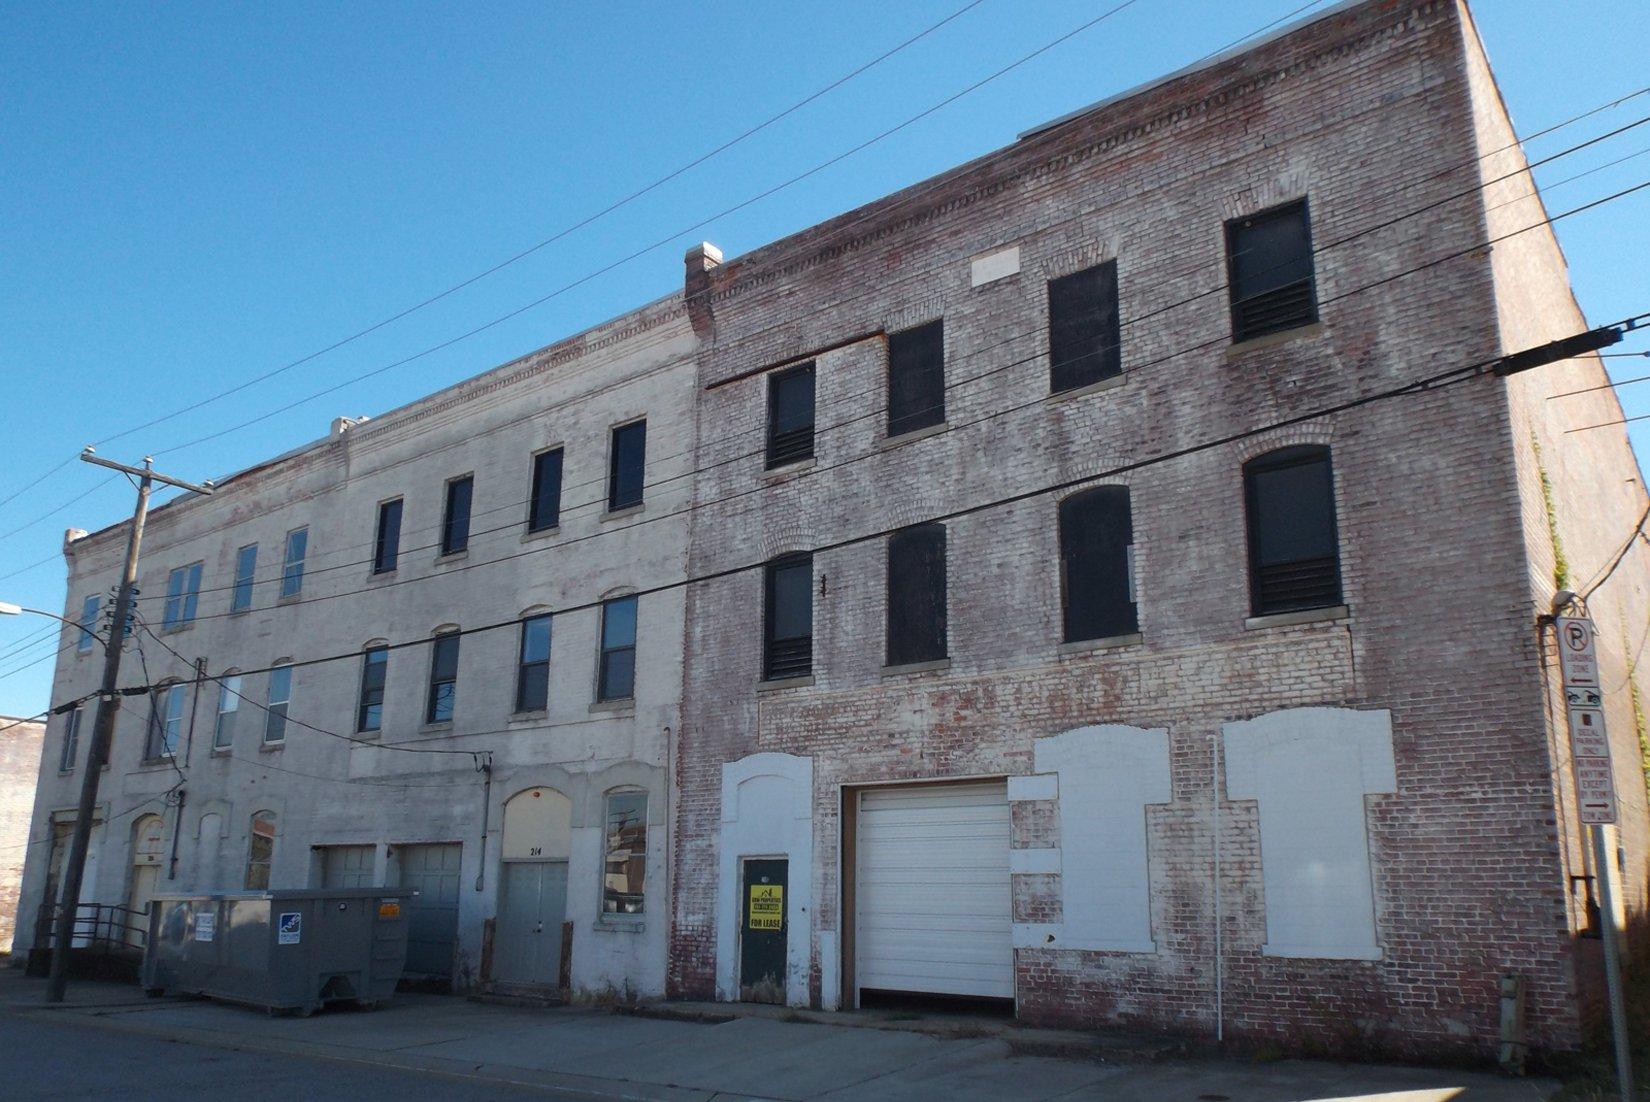 Walker-Wilkins-Bloxom Warehouse Historic District